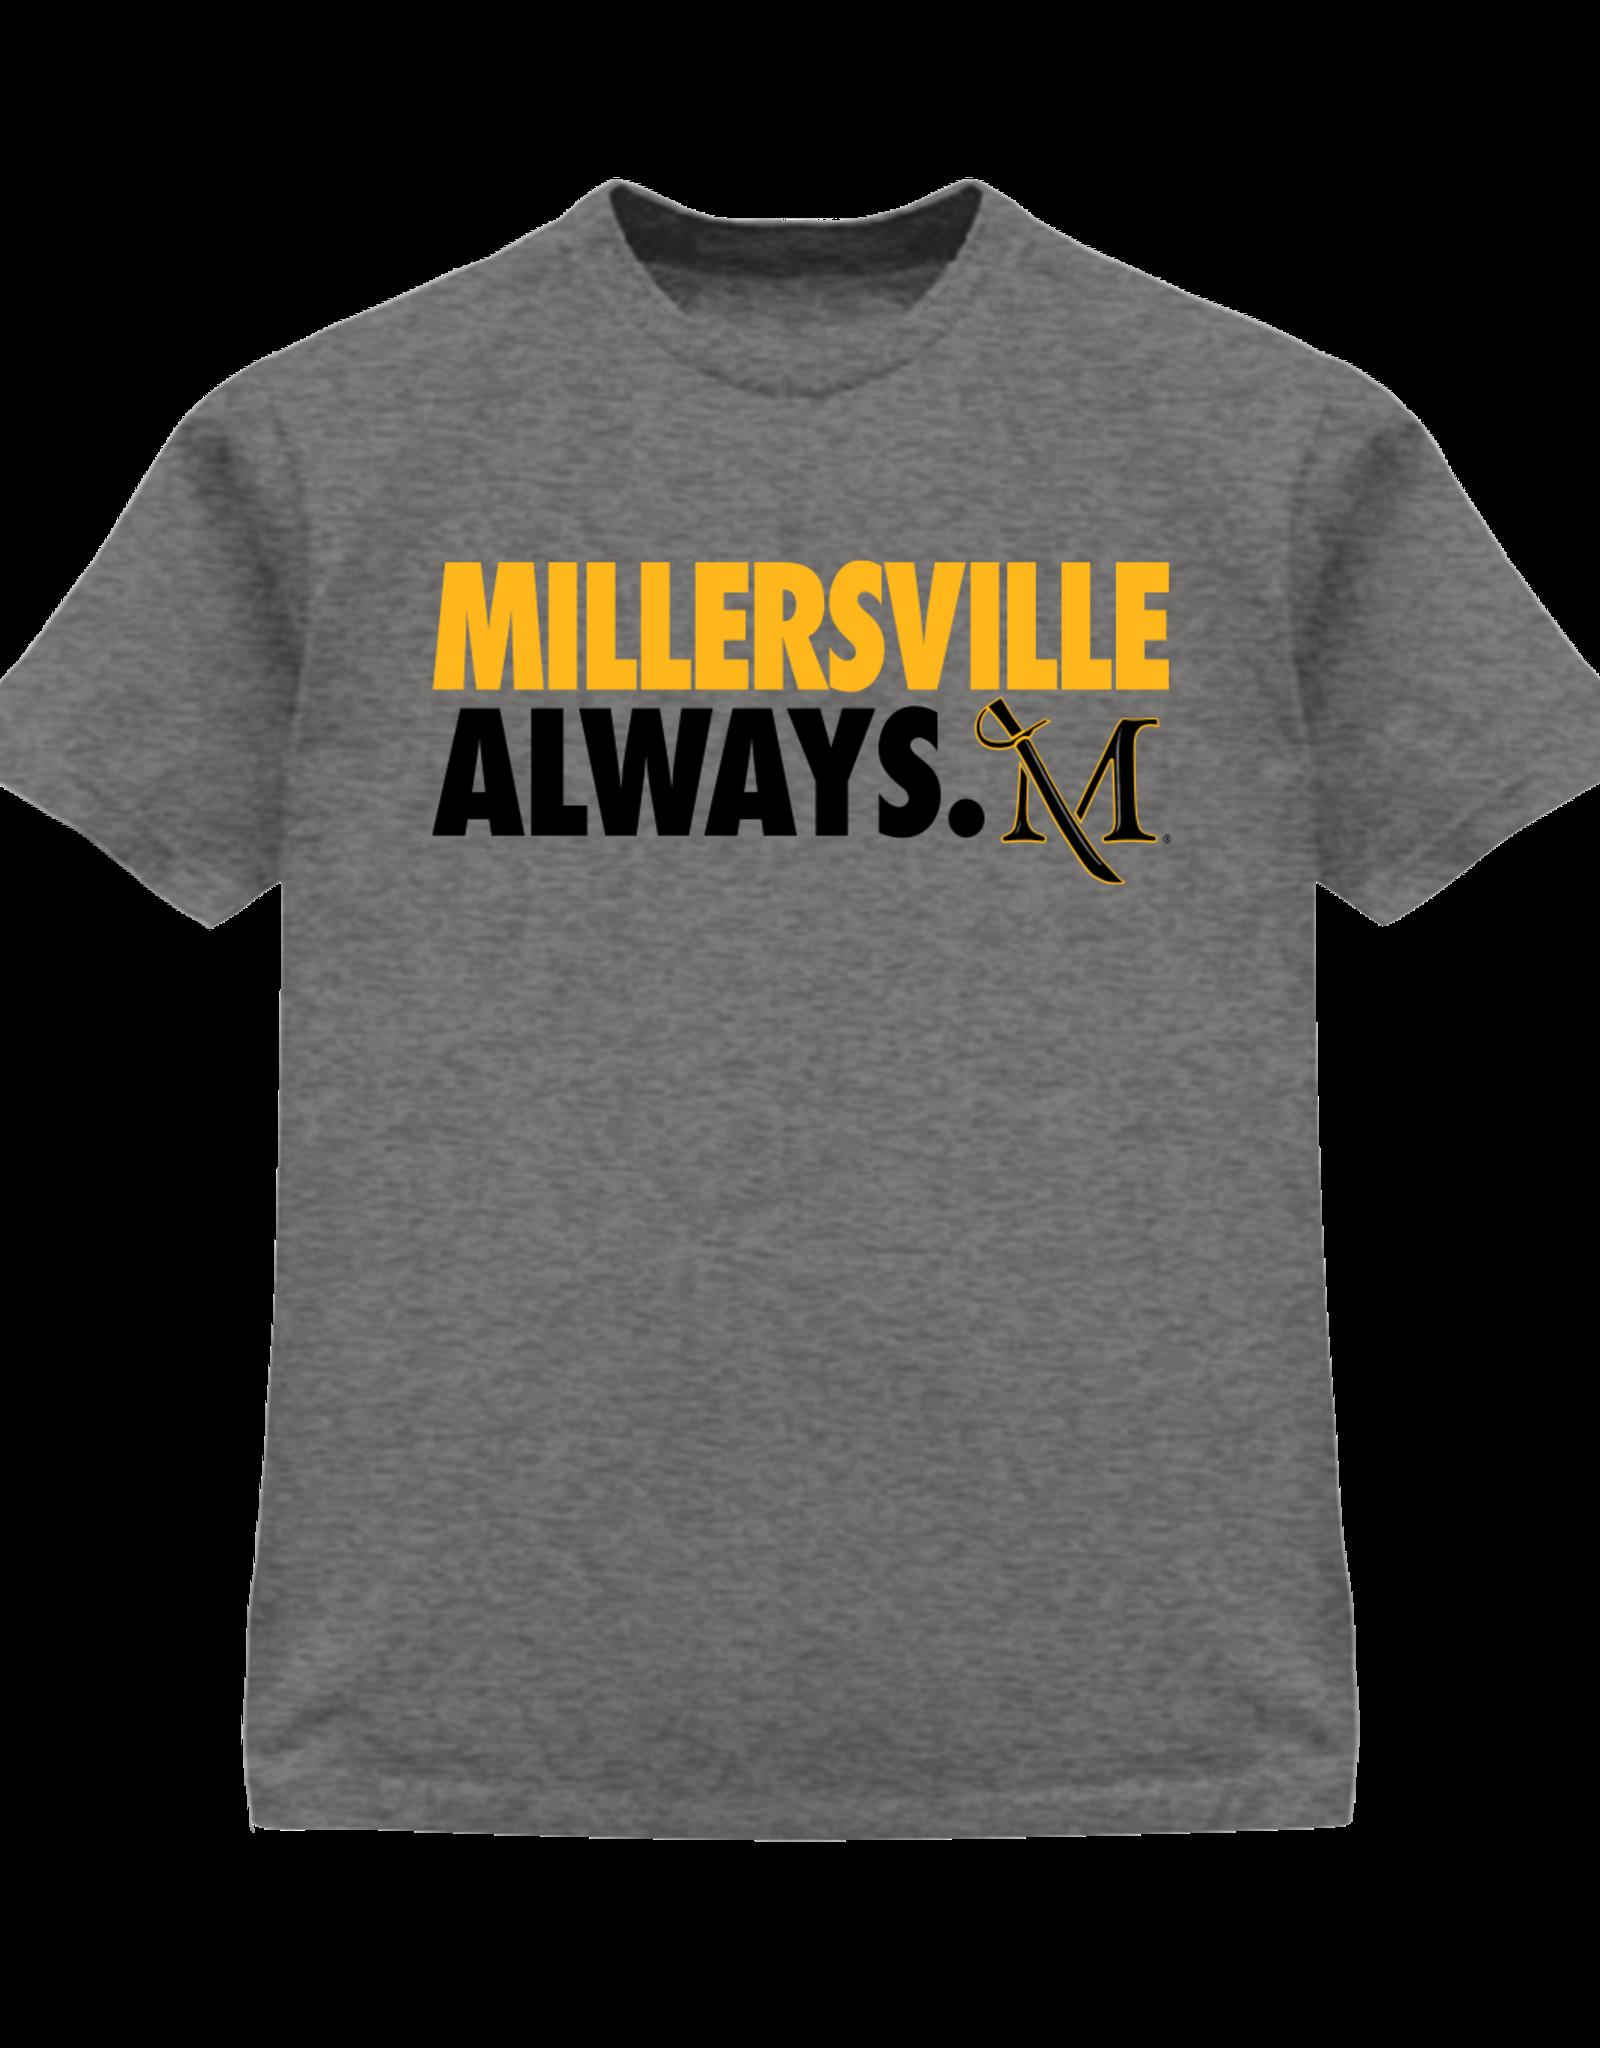 Millersville Always Tee